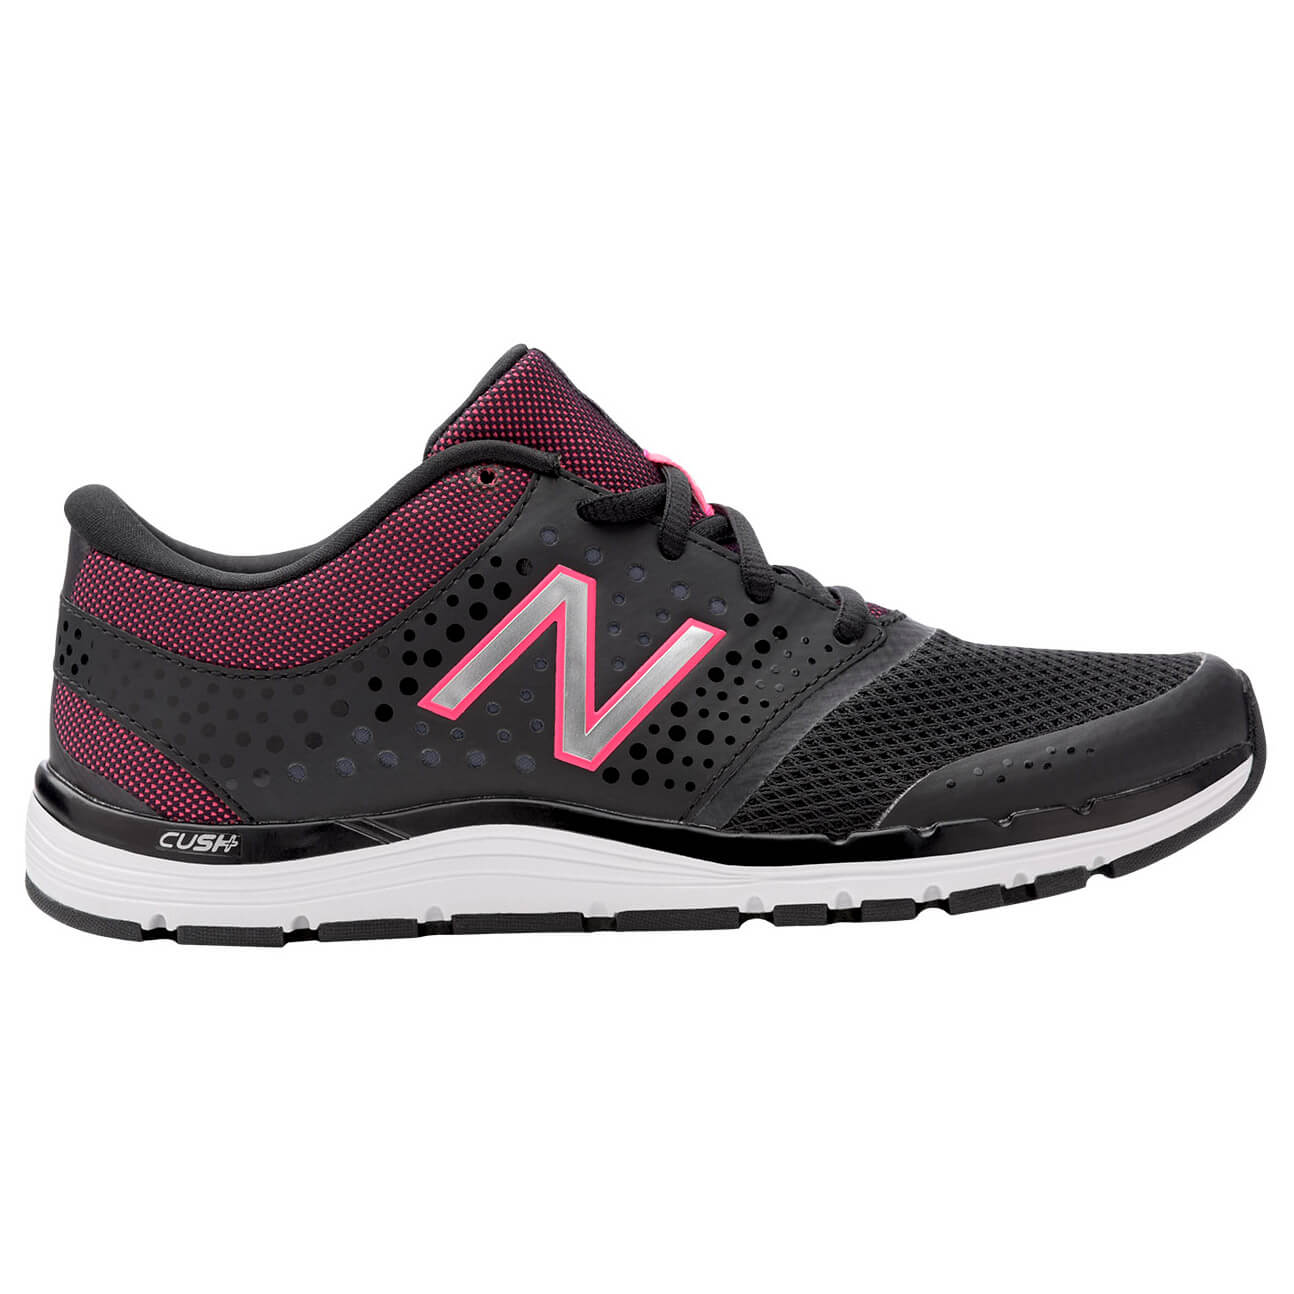 New Balance - Women's Training WX577 v4 - Fitnessschuh Black / Alpha Pink